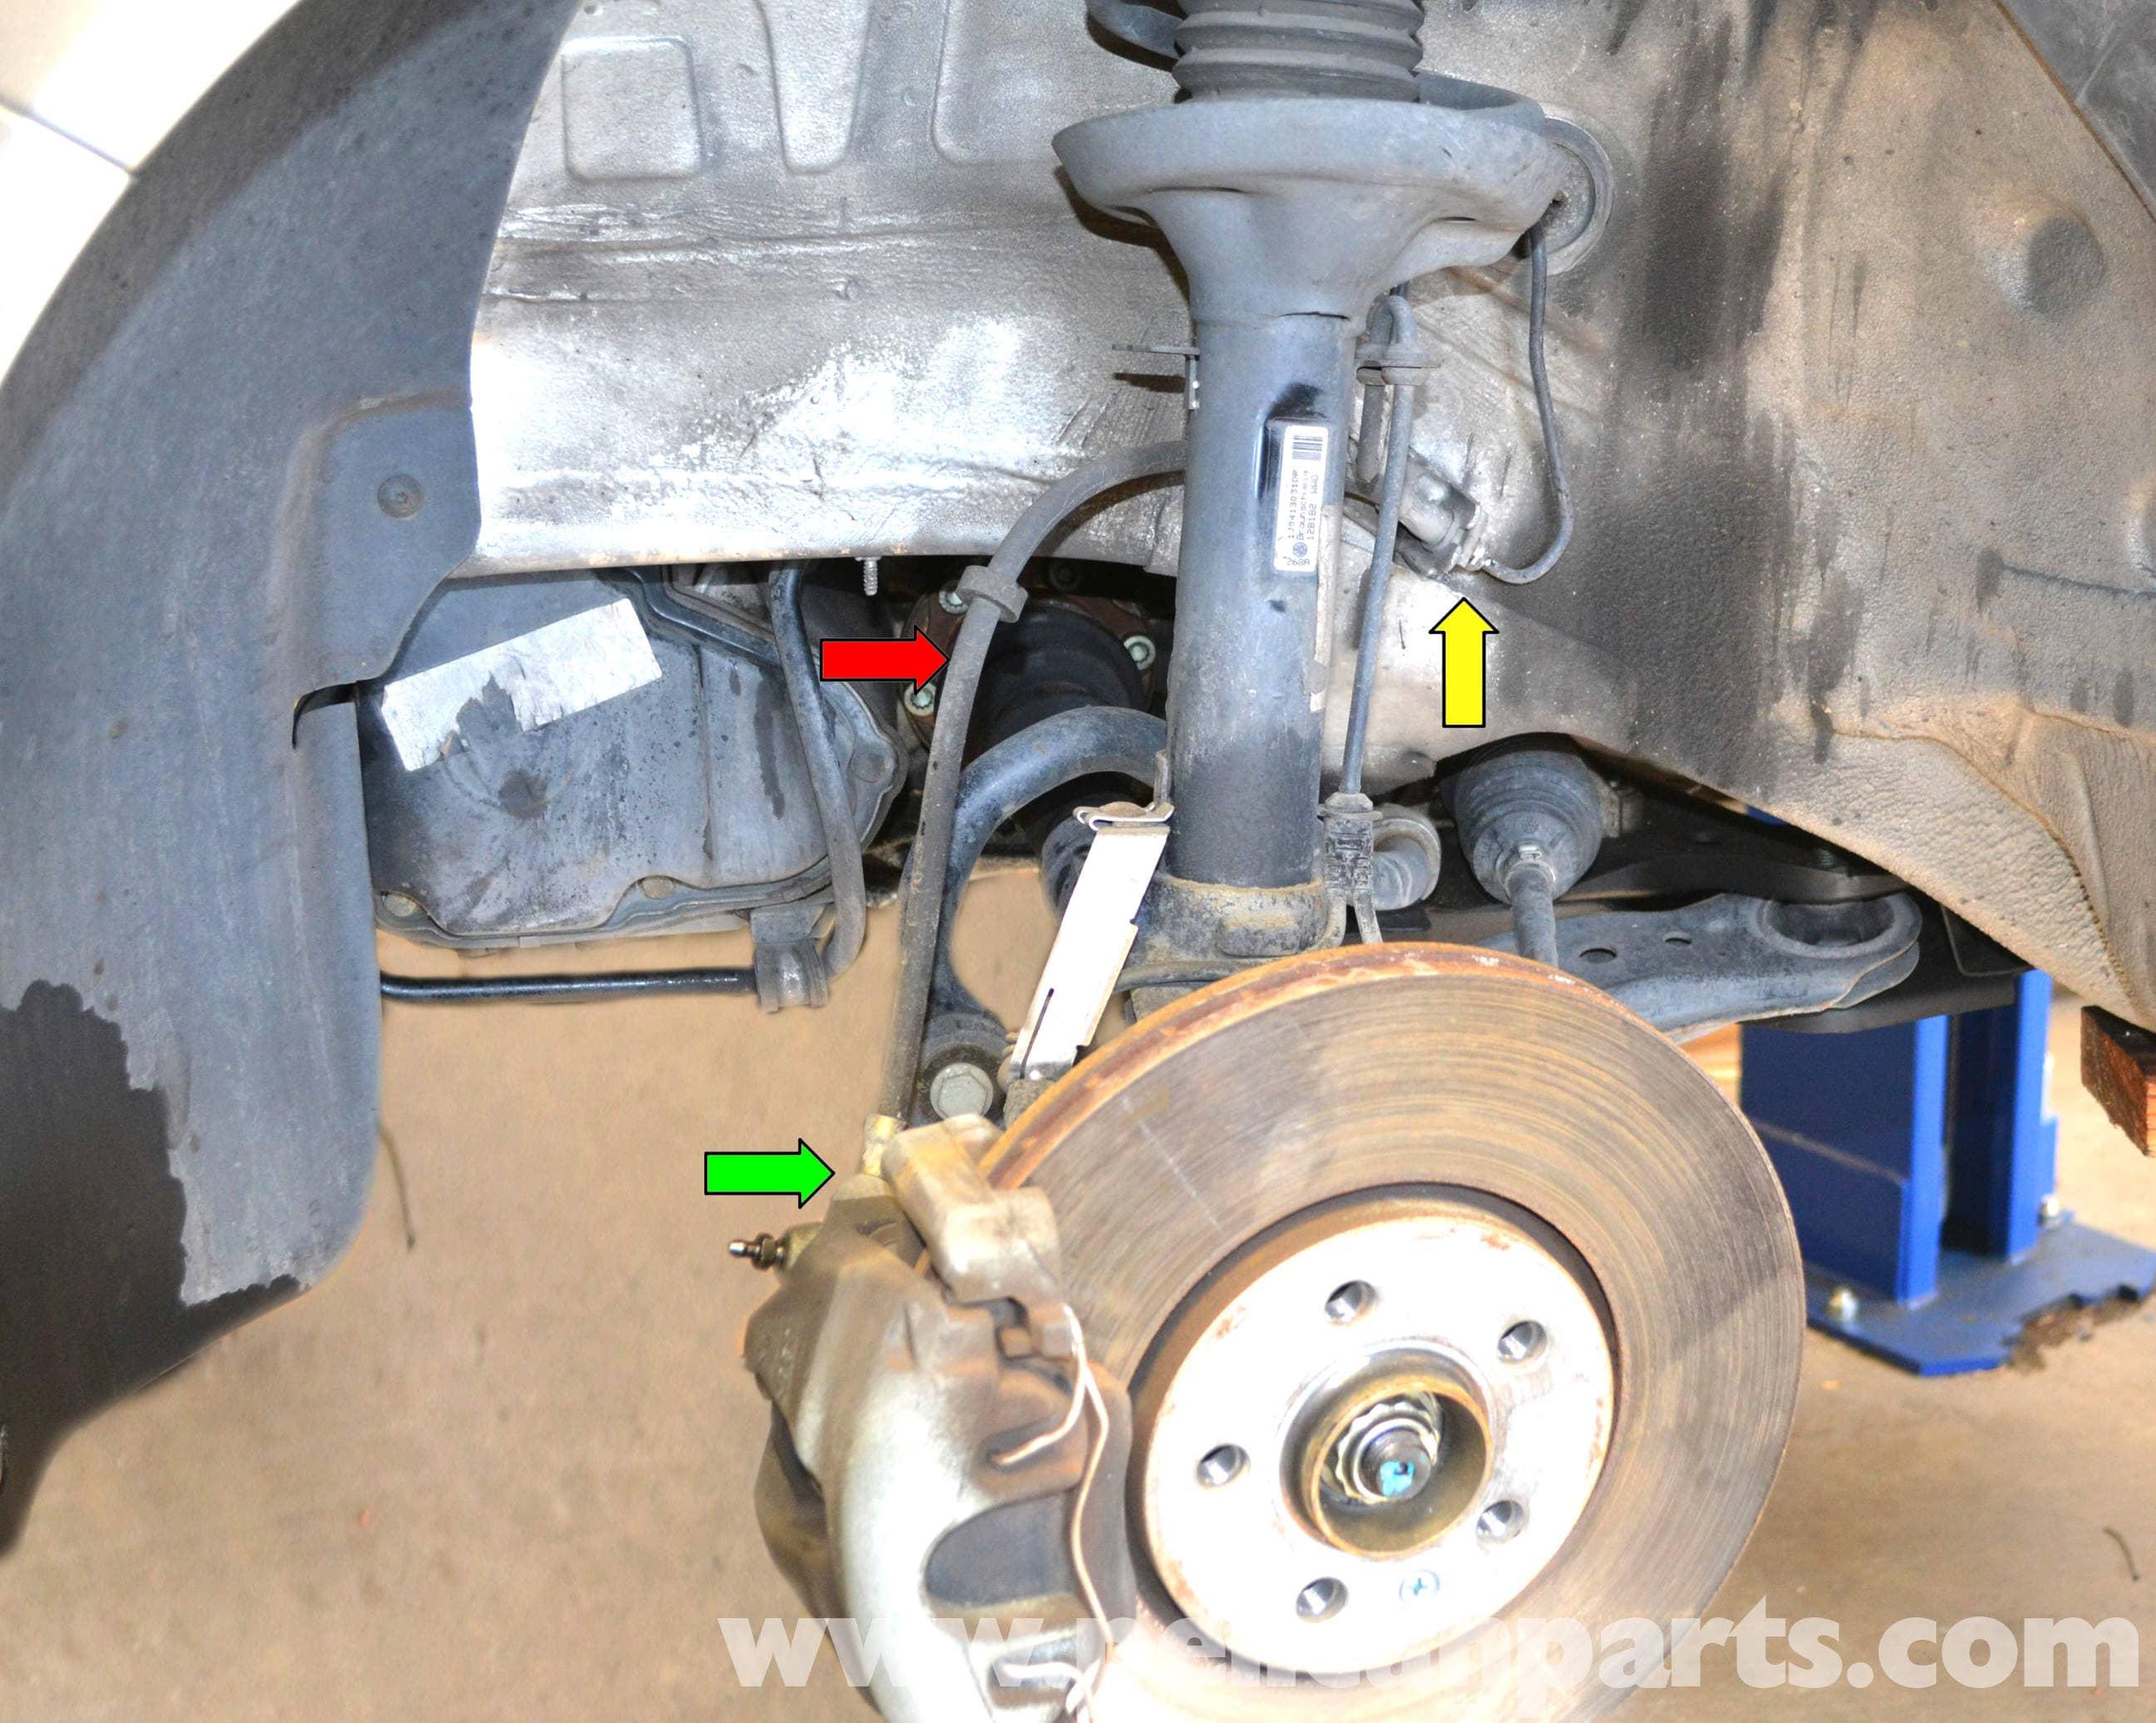 Volkswagen Golf Gti Mk Iv Brake Line Replacement 1999 2005 Car System Diagram Passenger Large Image Extra